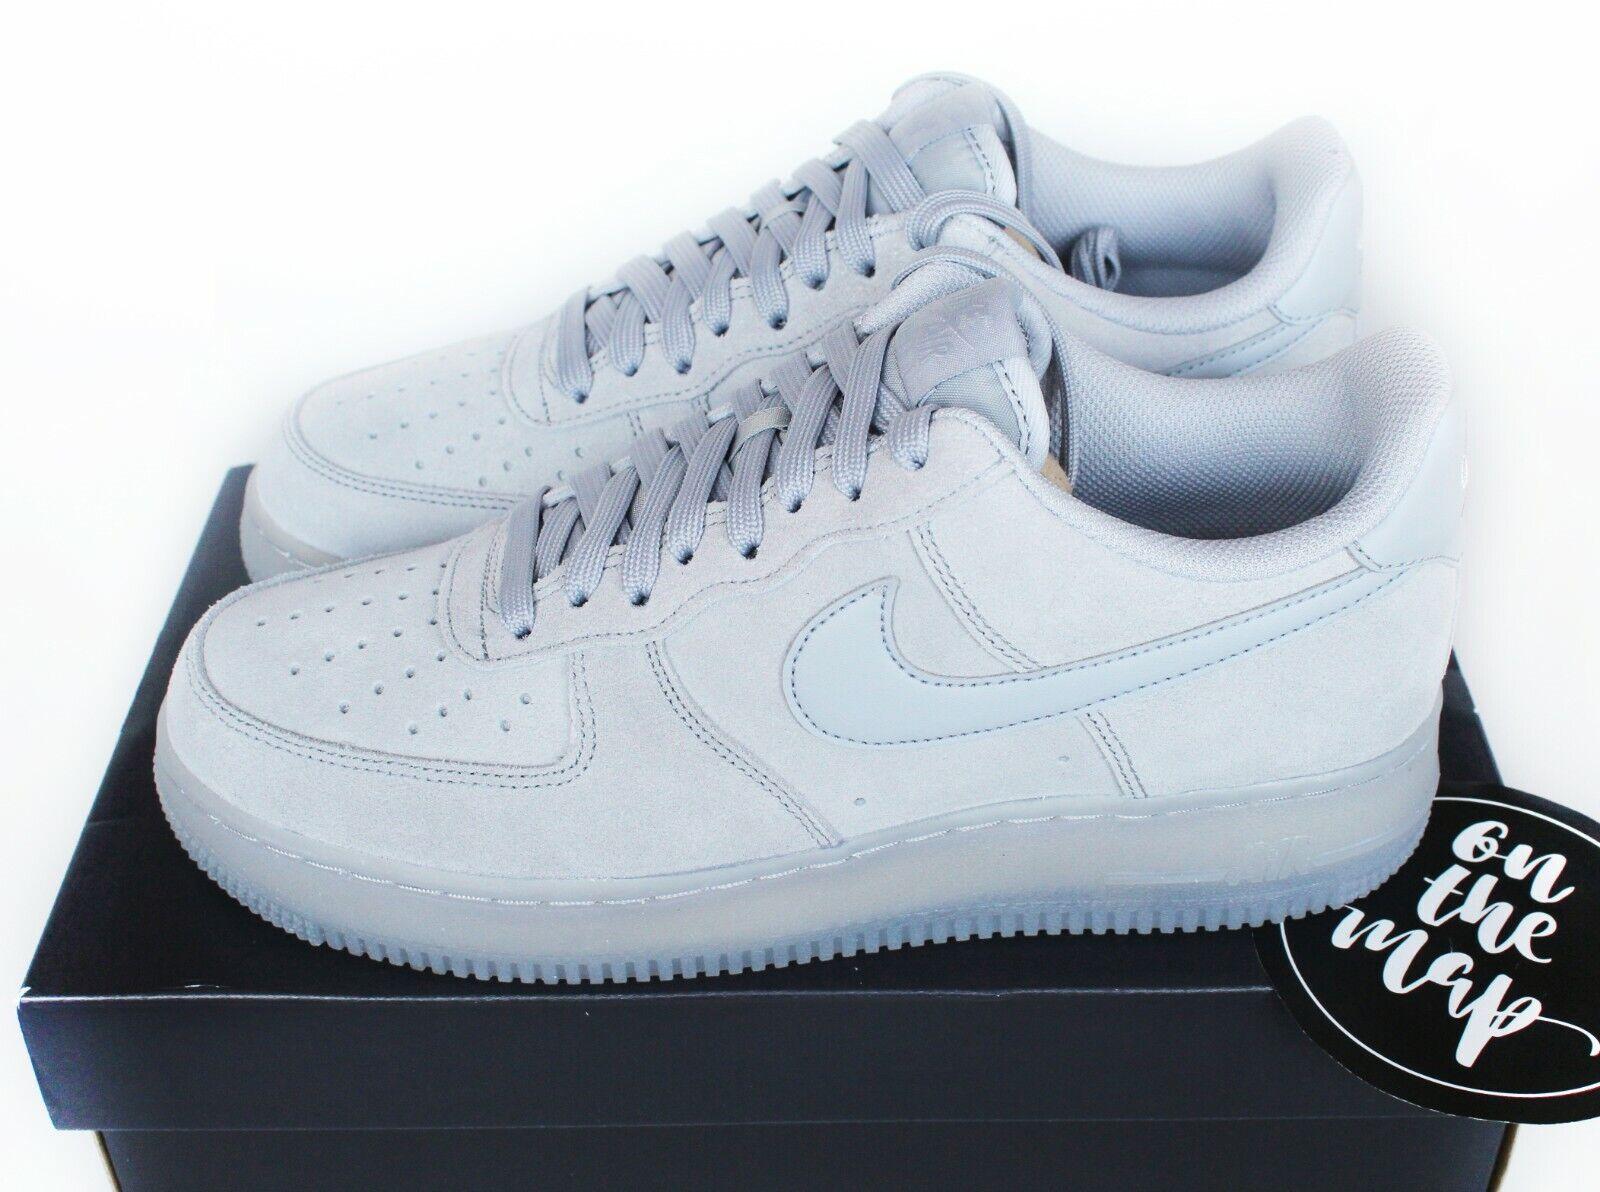 Nike Air Force 1 af1 '07 lv8 3 Wolf grau Wildleder UK 5 6 7 8 9 10 11 12 US NEU